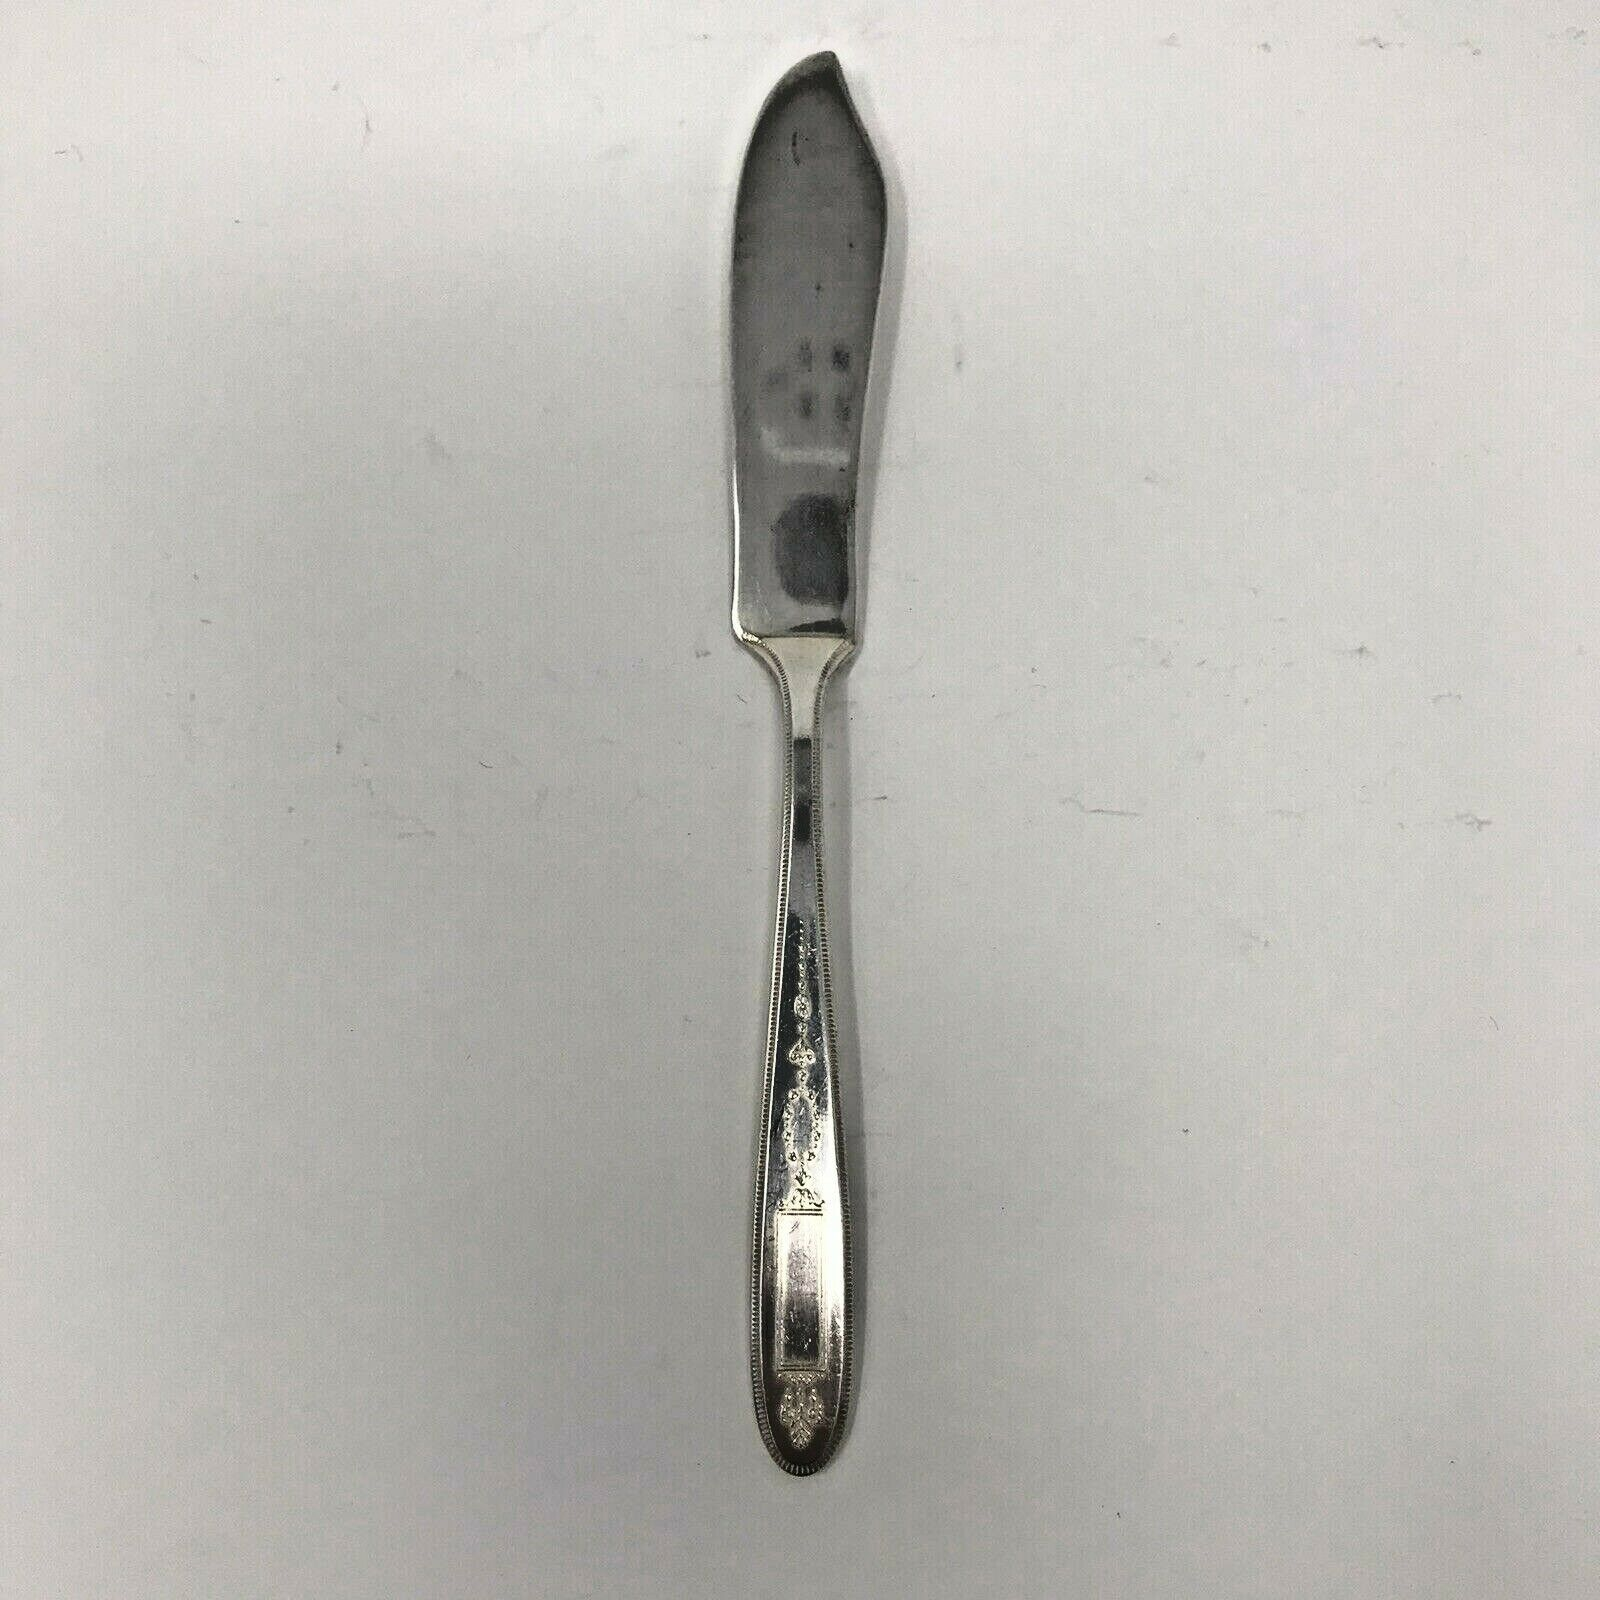 "Community Plate Silverware 7"" Butter Knife - $11.64"